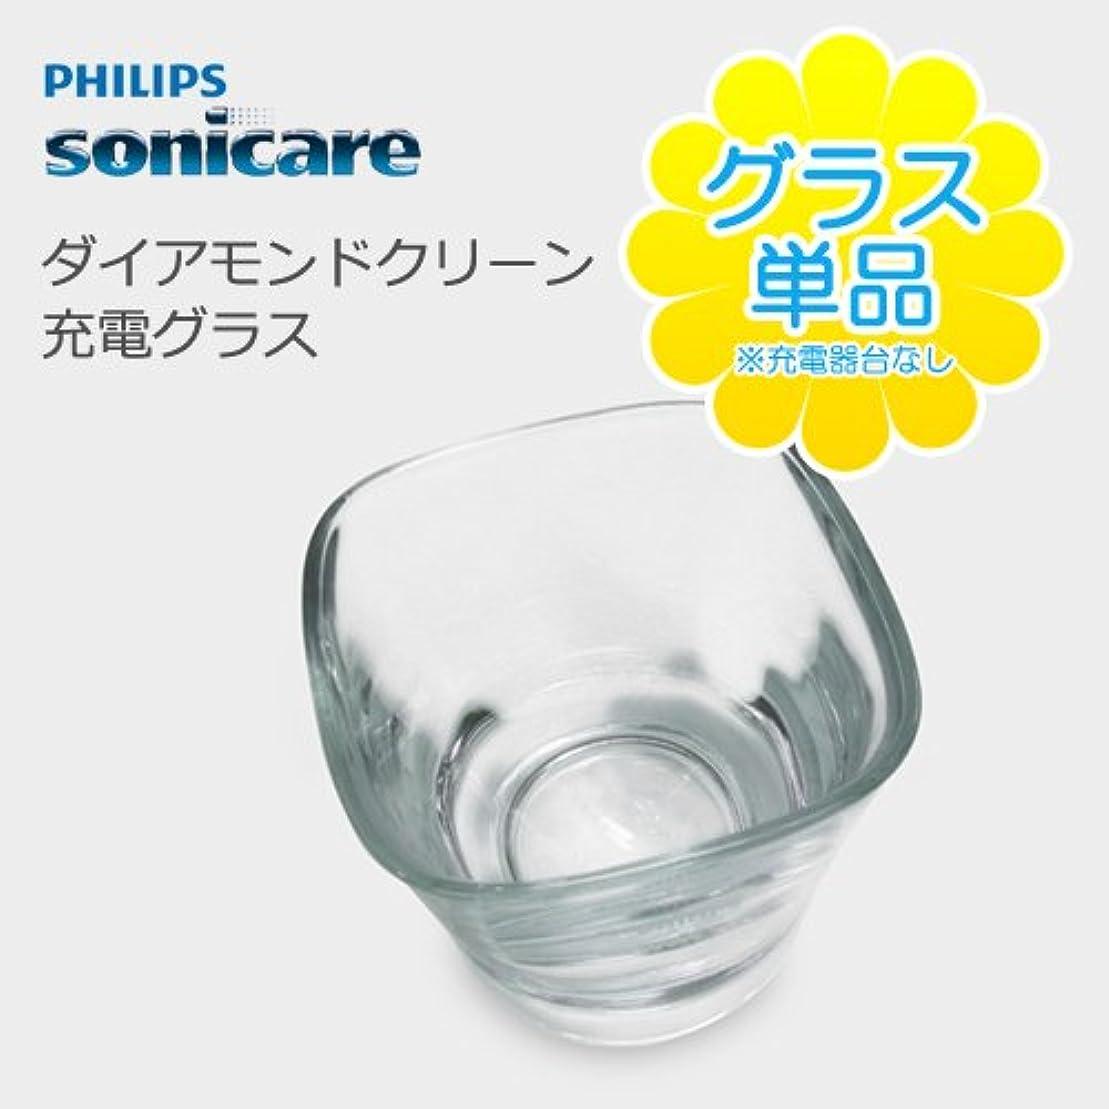 PHILIPS sonicare DiamondClean 充電グラス(単品) ソニッケアーダイヤモンドクリーンをお持ちの方におすすめ!充電グラスのみの販売です HX9303/04 HX9353/54 HX9333/04...